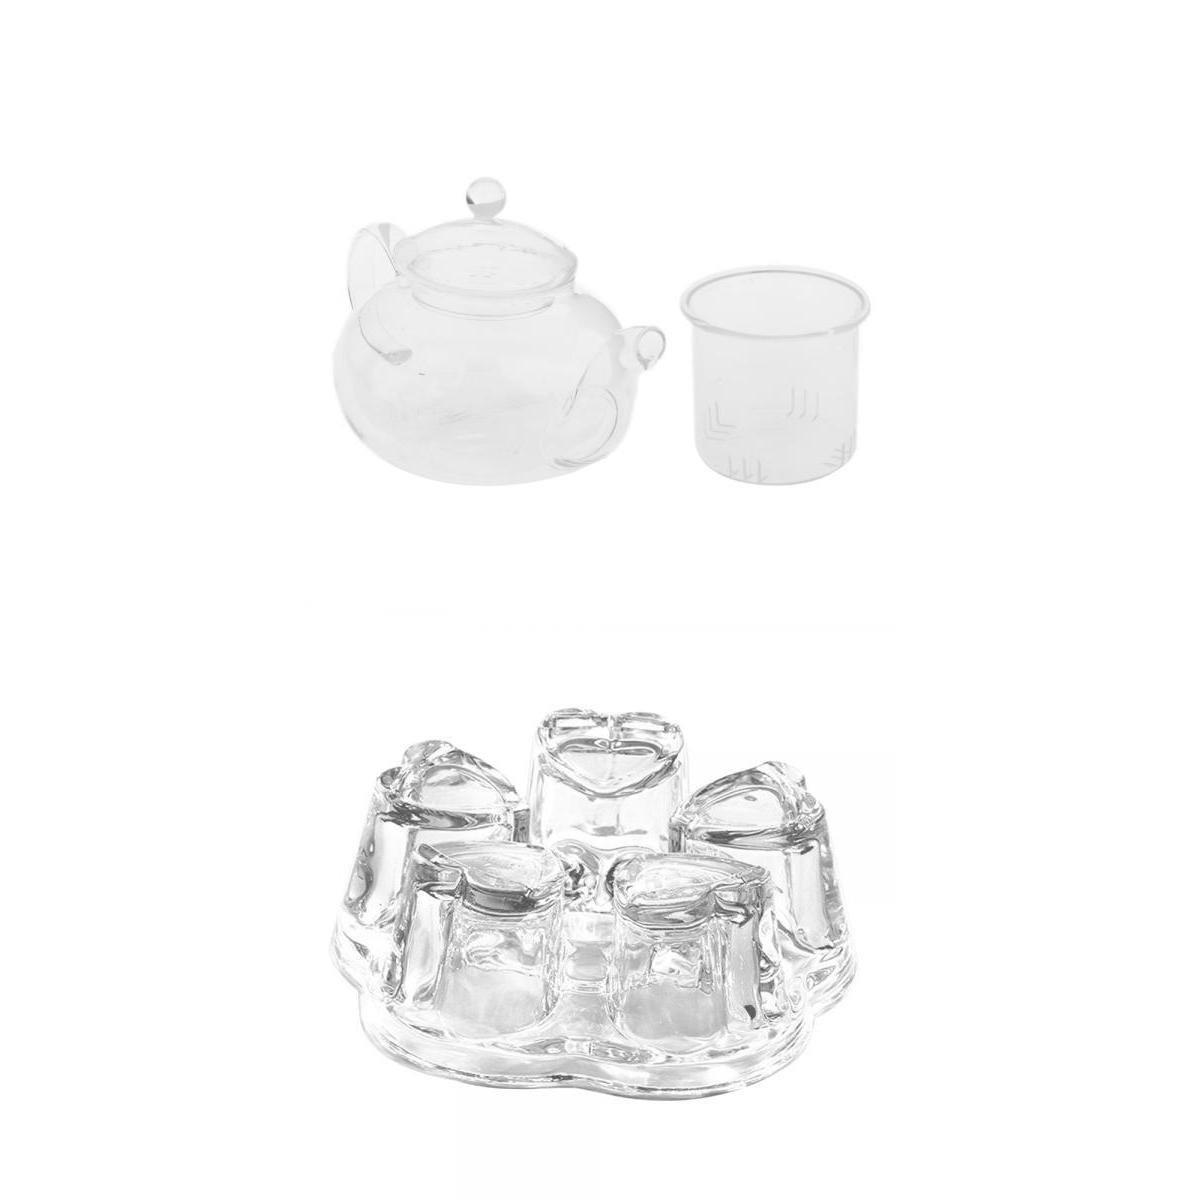 Dovewill Heat Resistant Glass Teapot Warmer Heating Base Coffee Water Teapot Combo